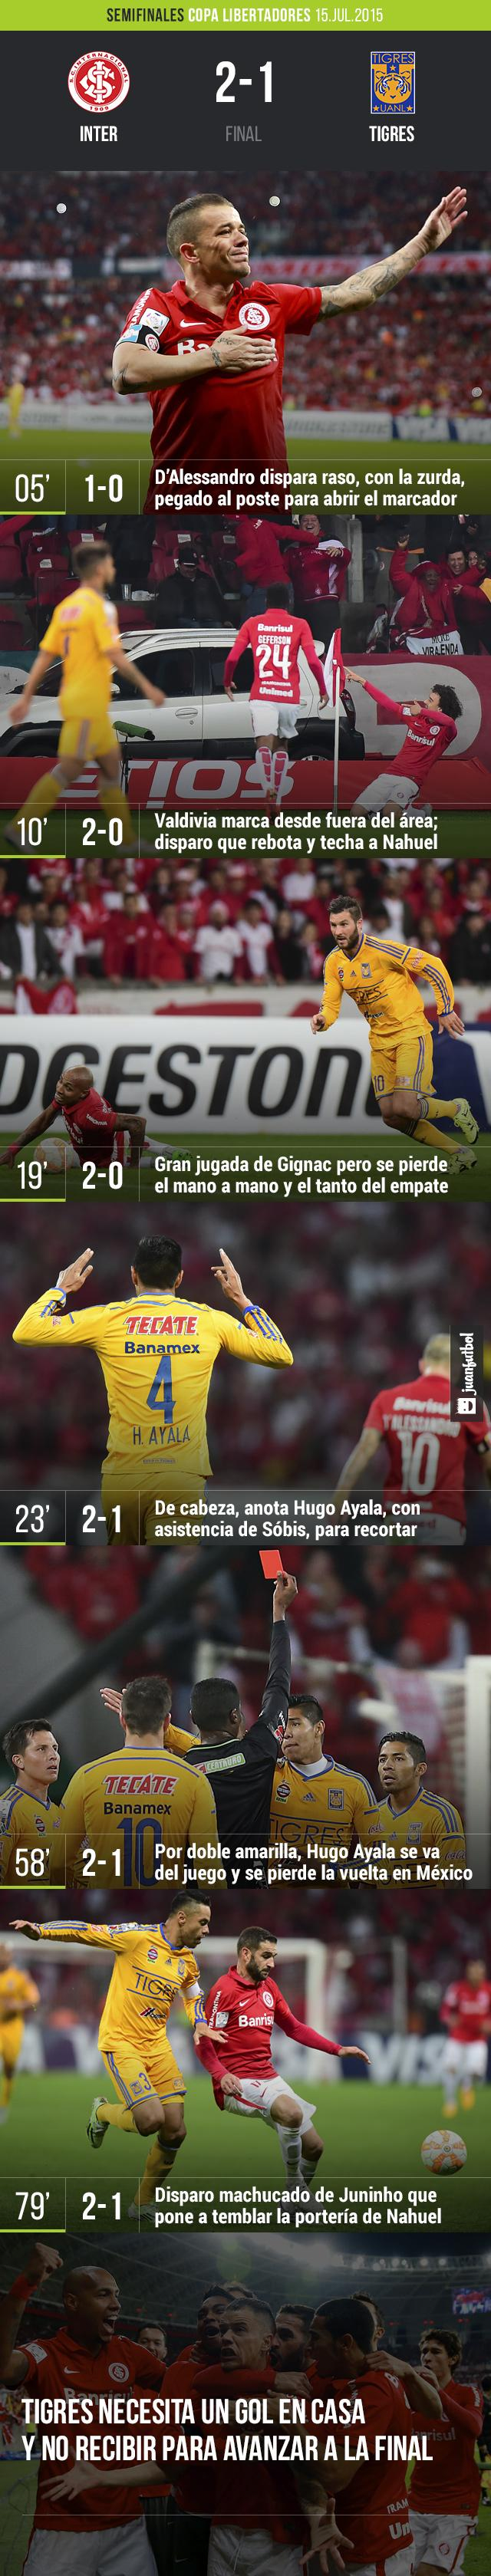 Inter 2-1 Tigres